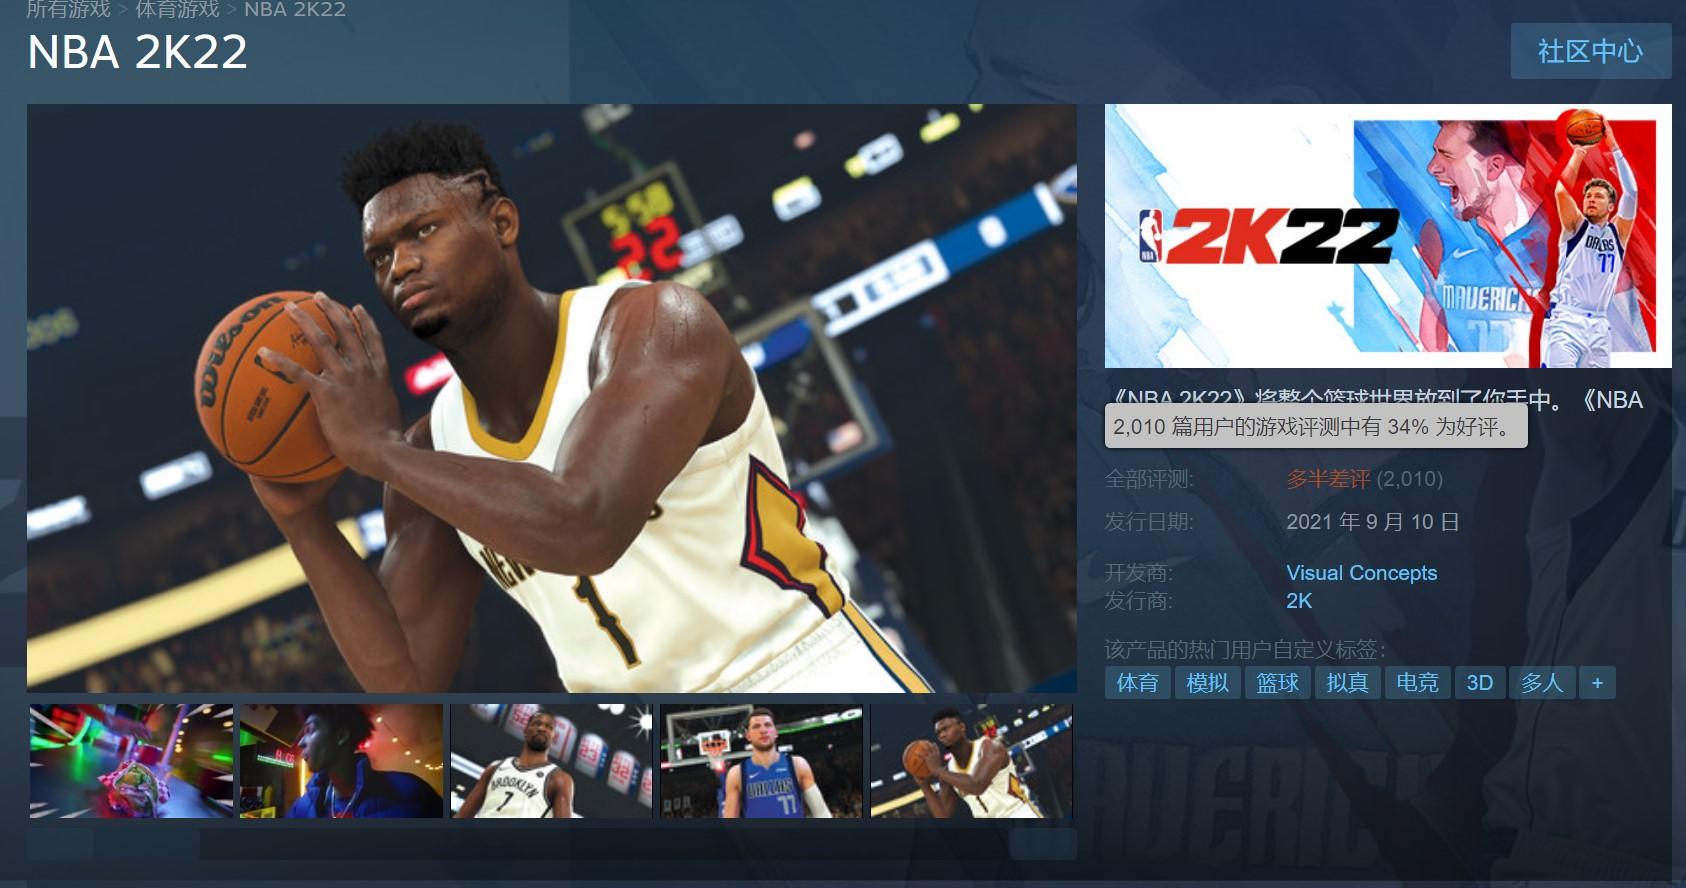 《NBA 2K22》媒體評分出爐:獲IGN 7分M站均分71